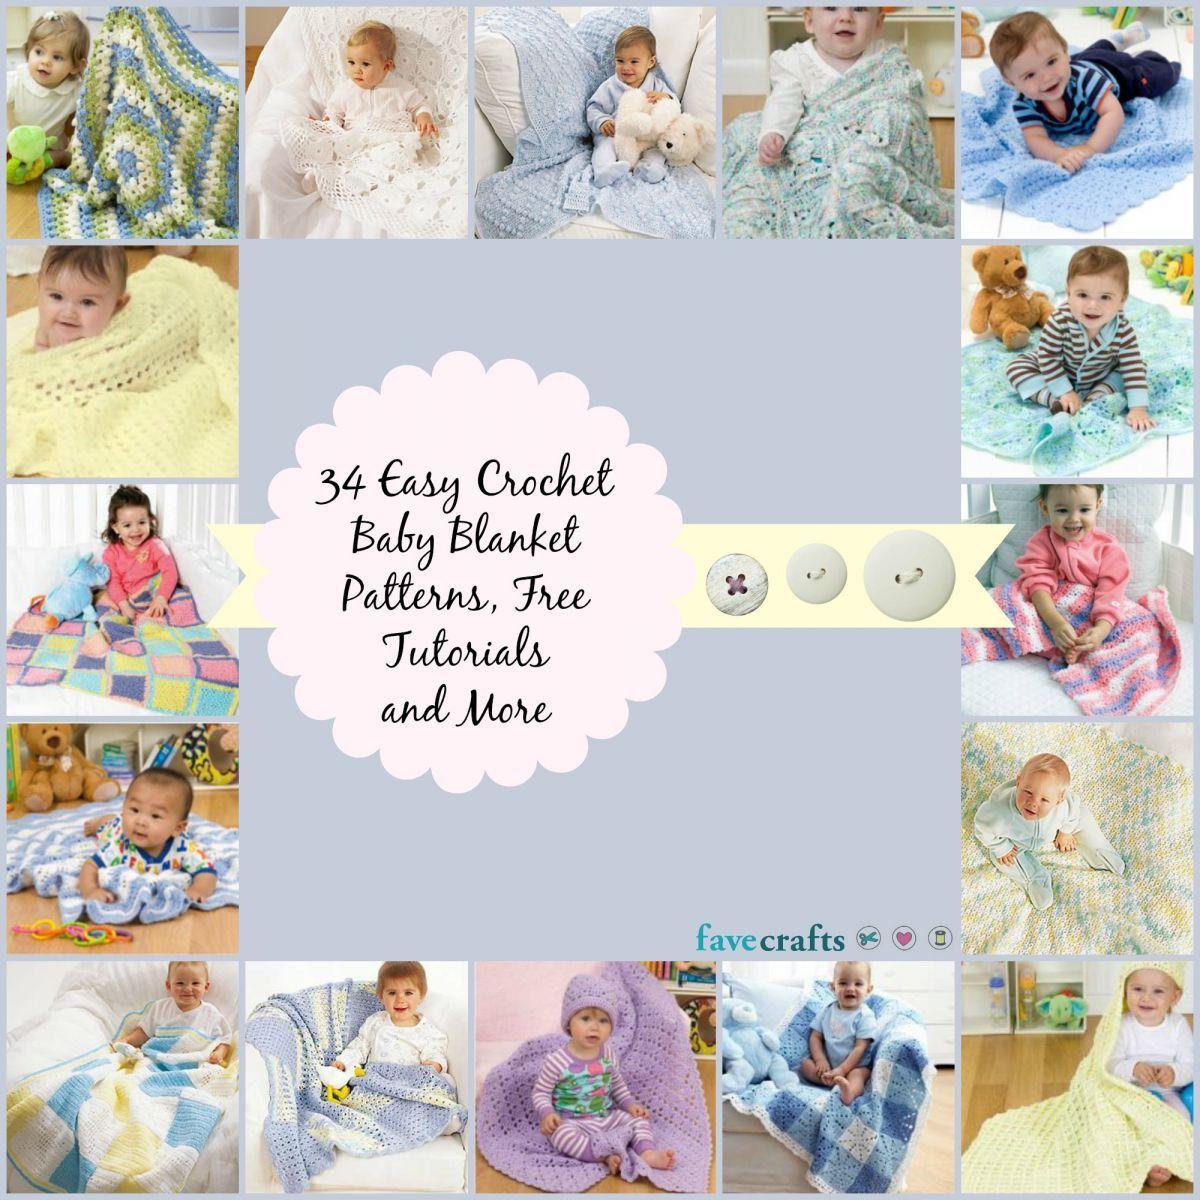 41 Easy Crochet Baby Blanket Patterns | Manta y Cobija